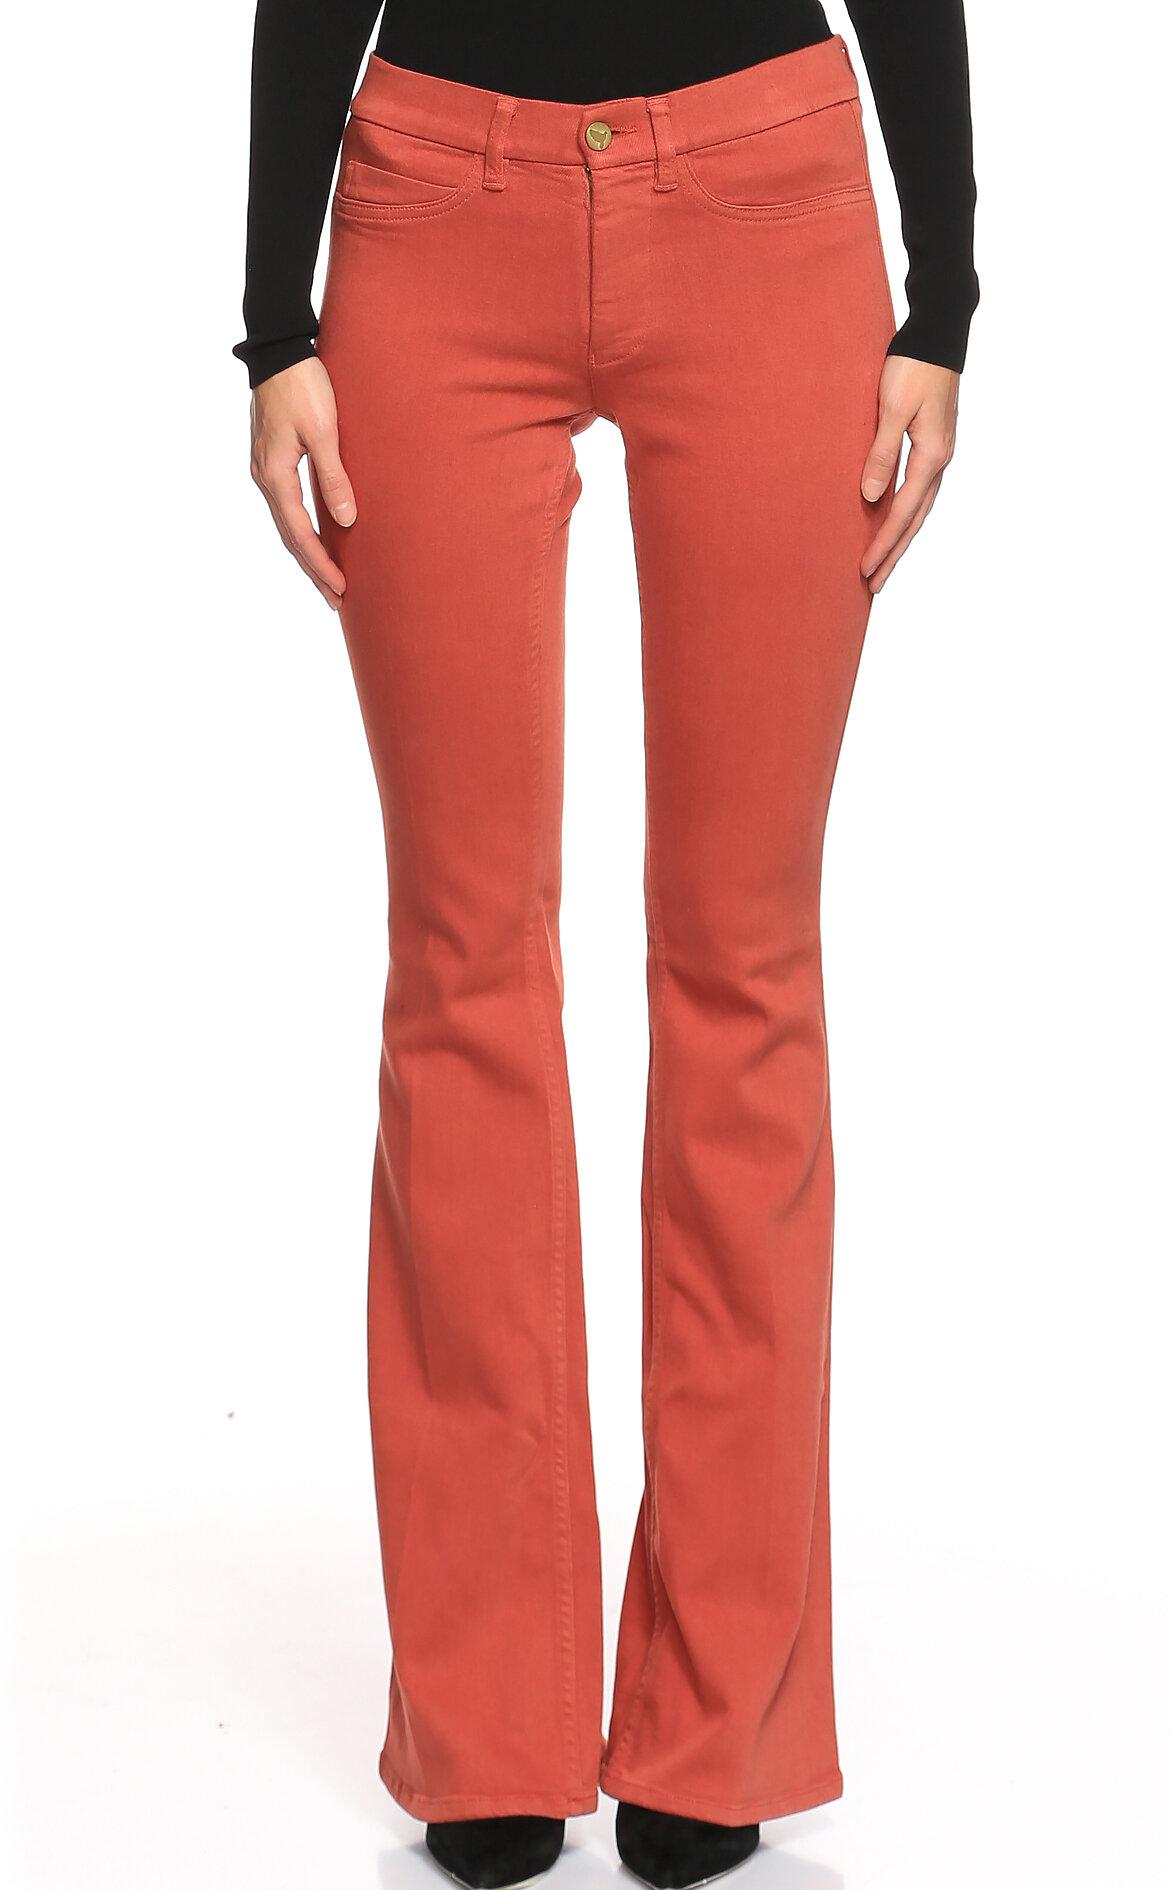 Mih Jeans-Mih Jeans İspanyol Kiremit Rengi Pantolon